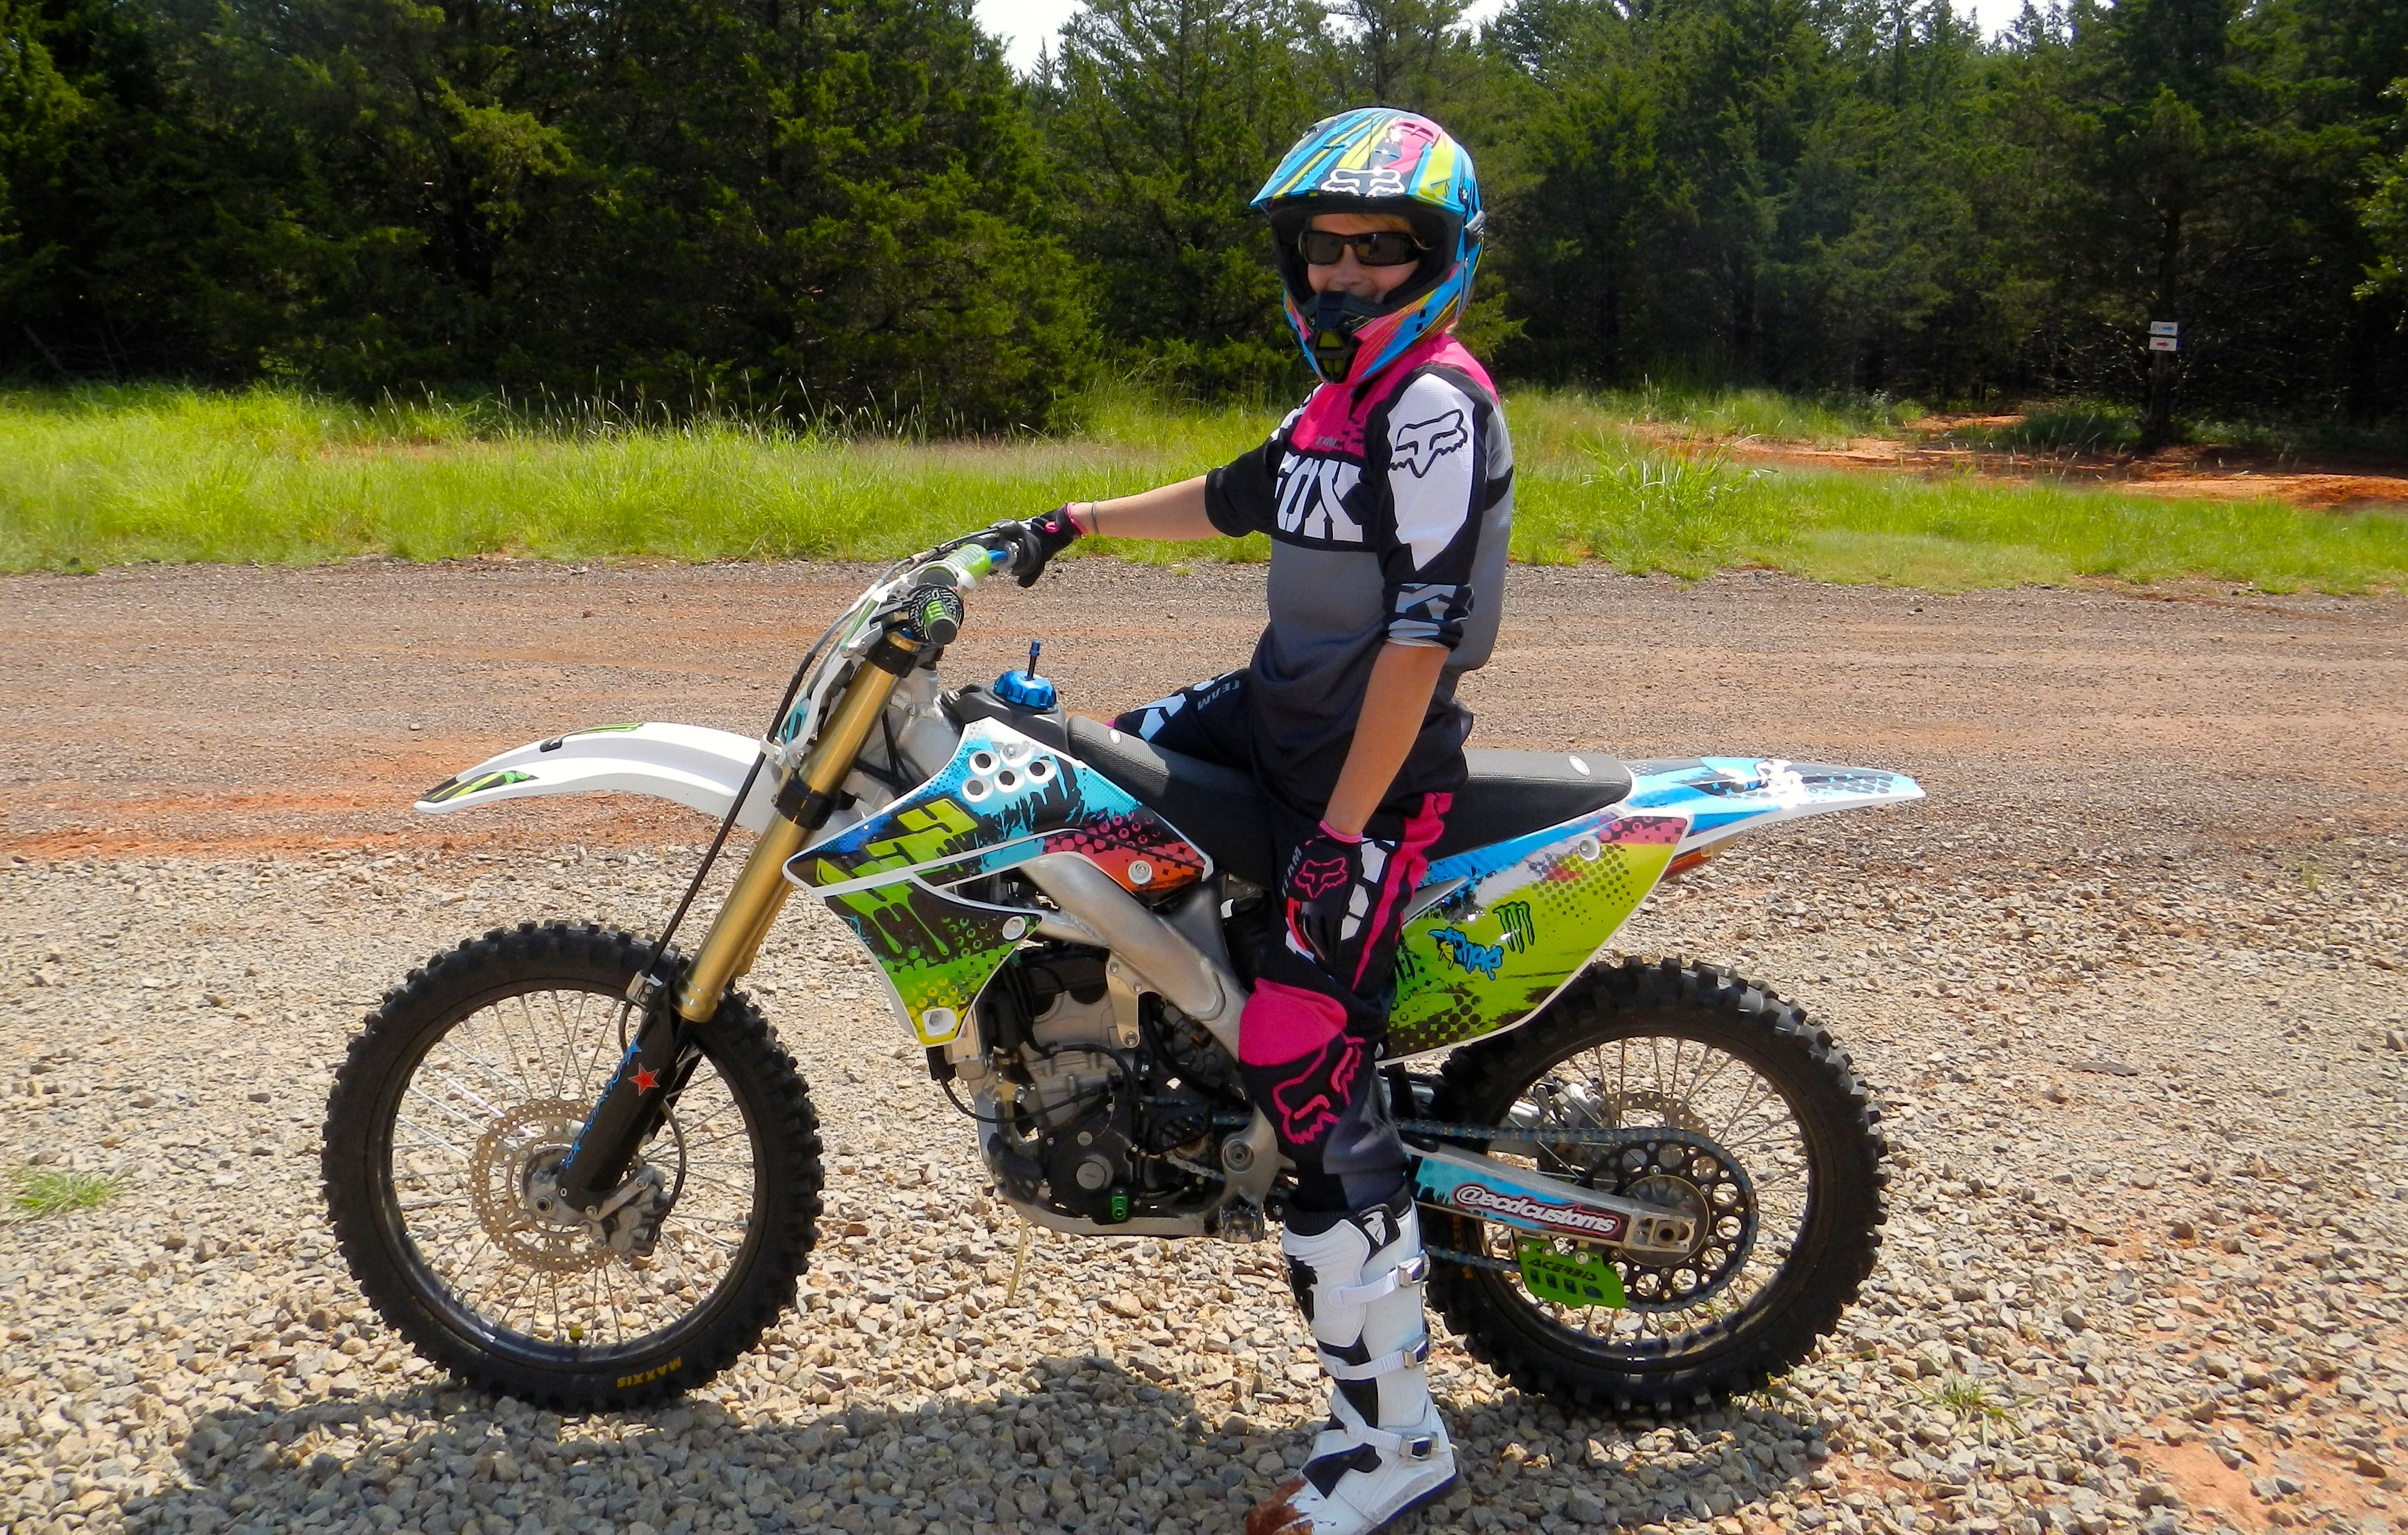 Amazoncom: girls dirt bike